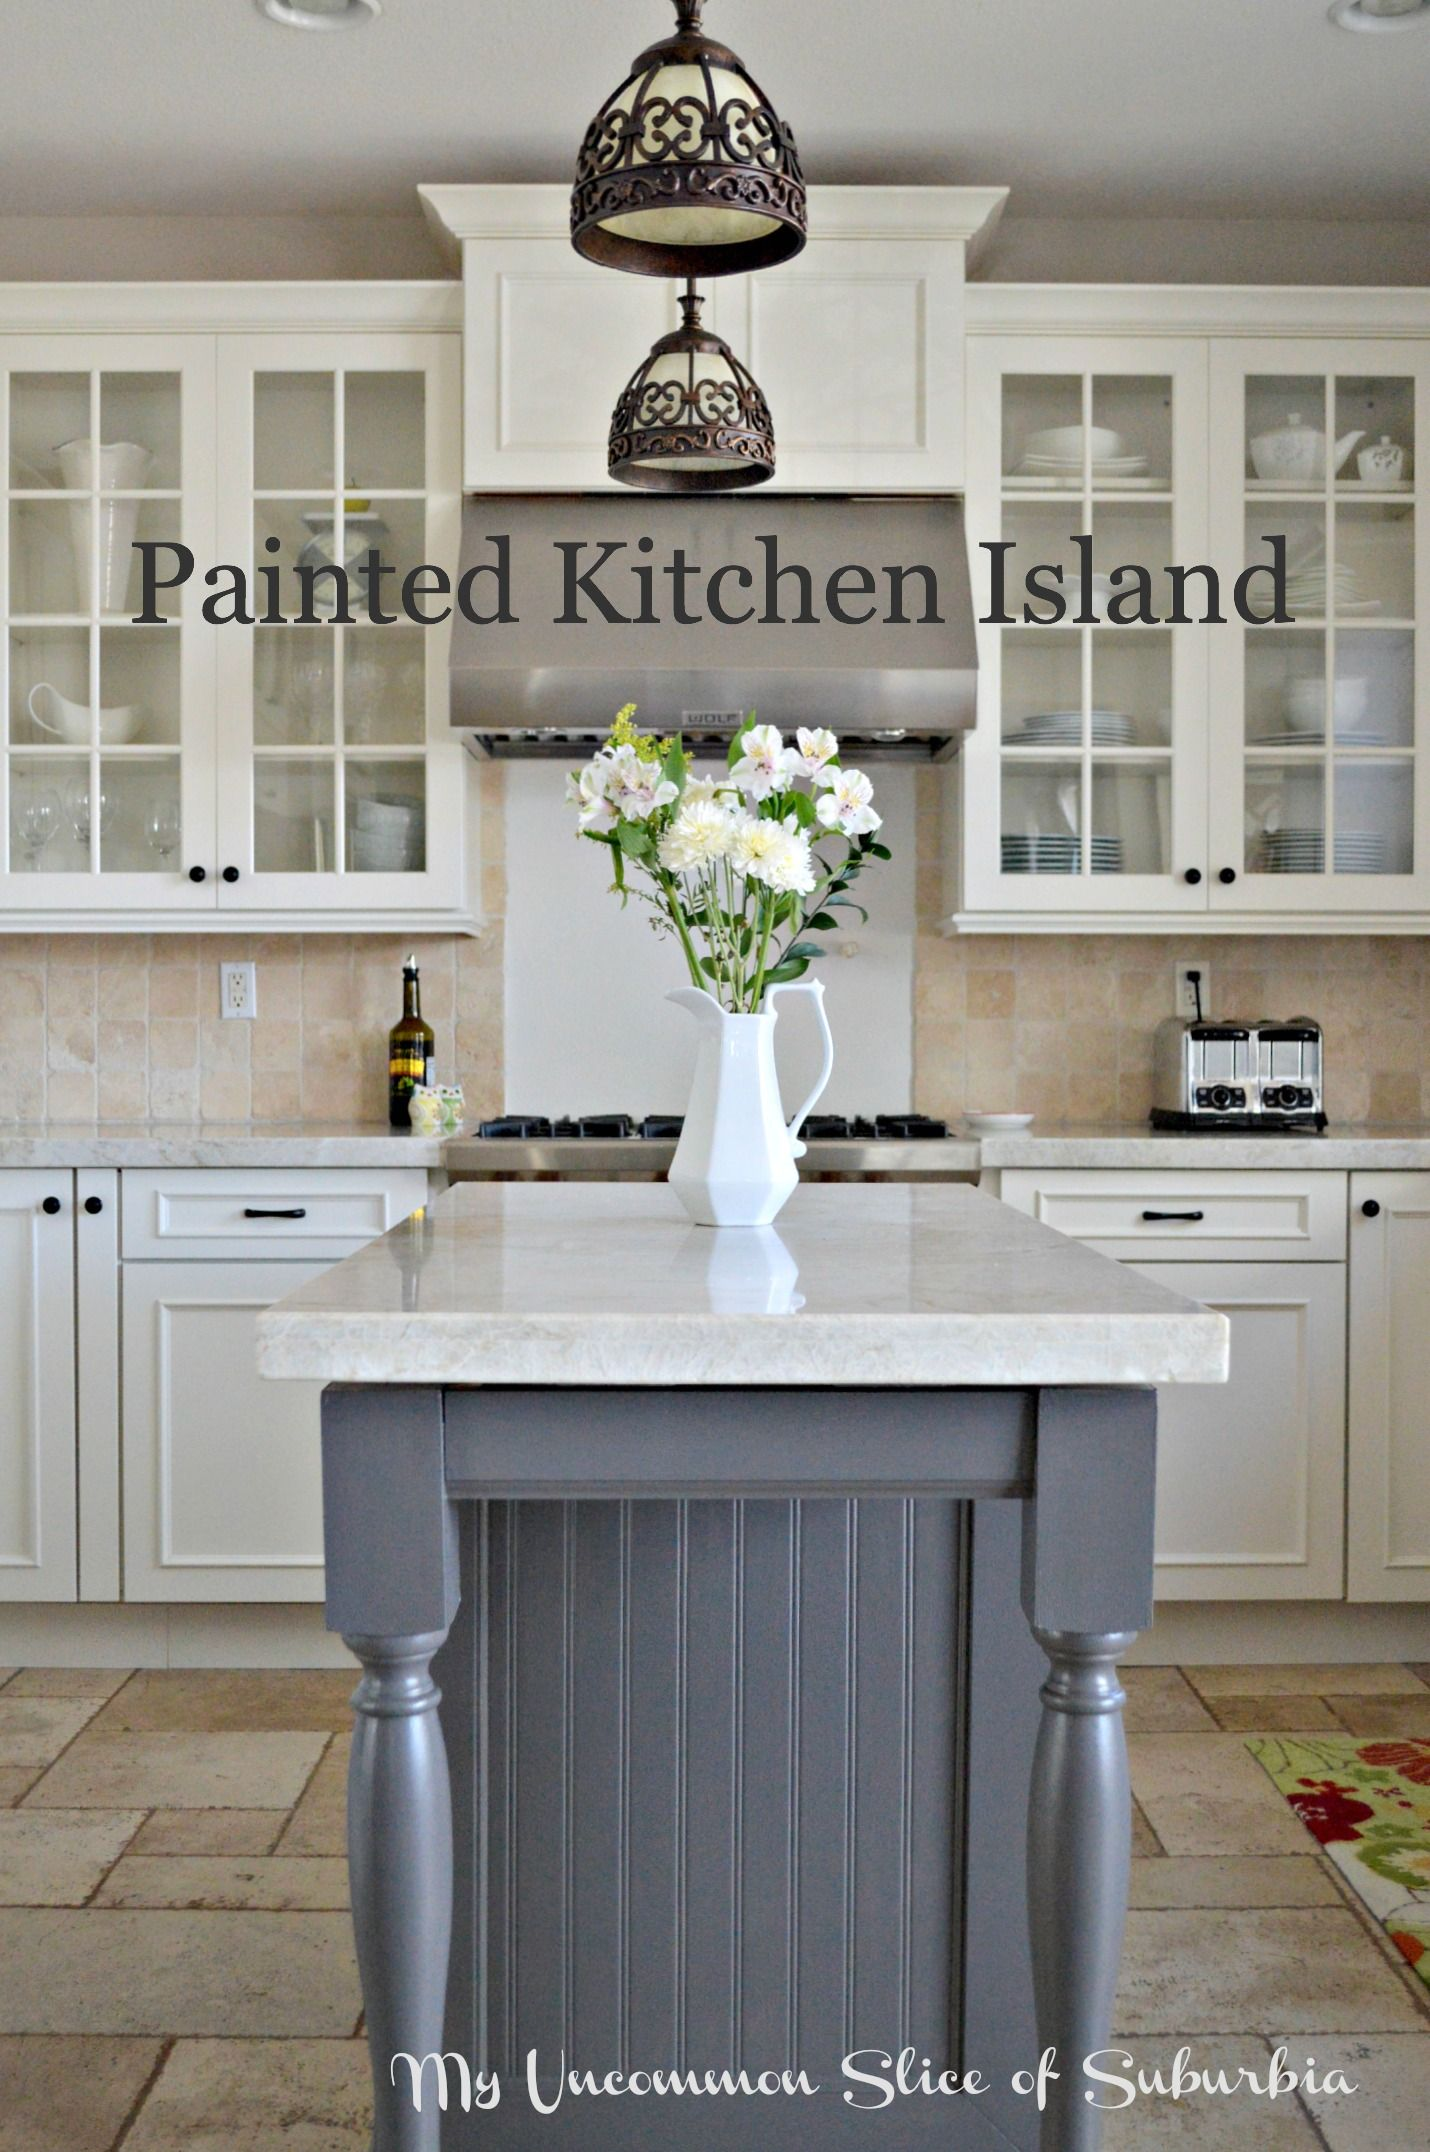 Painted Kitchen Island Diy Home Decor Painted Kitchen Island